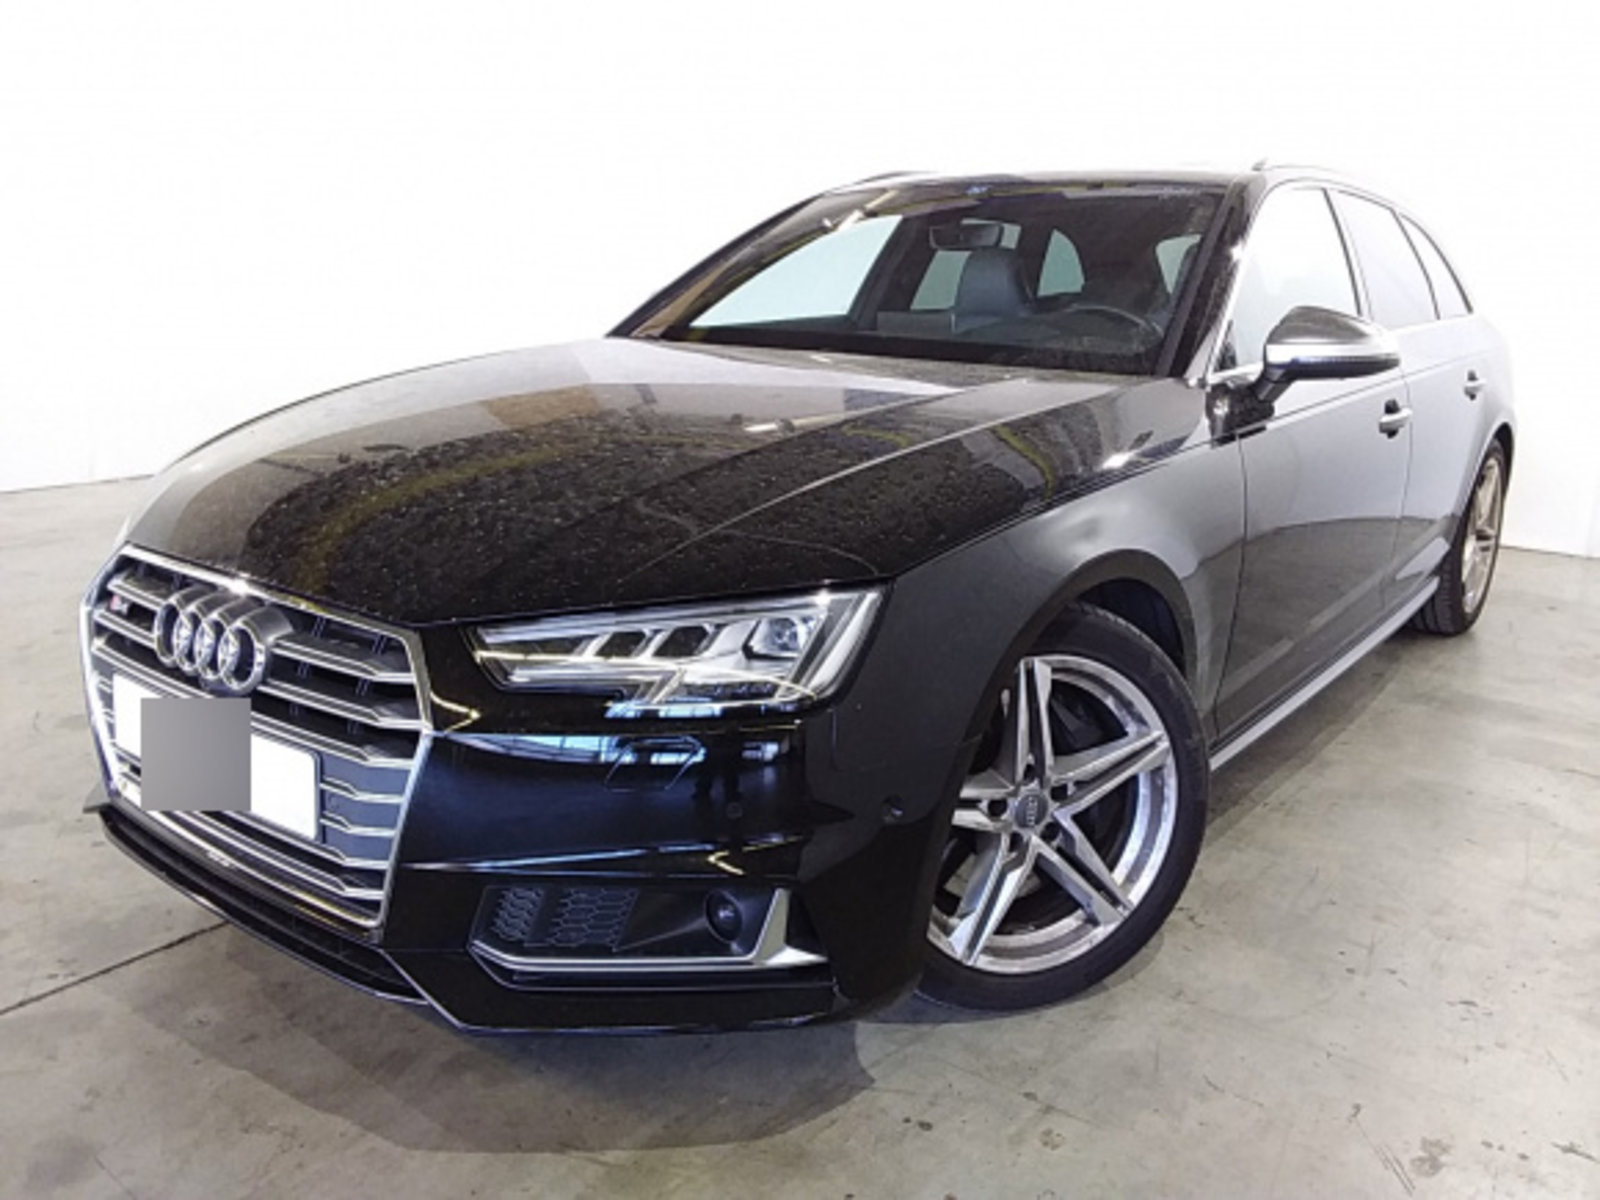 Audi S4 Avant 3.0TFSi Q S-SITZE/B&O/HuD/PANO/ACC/VC, Jahr 2017, Benzin